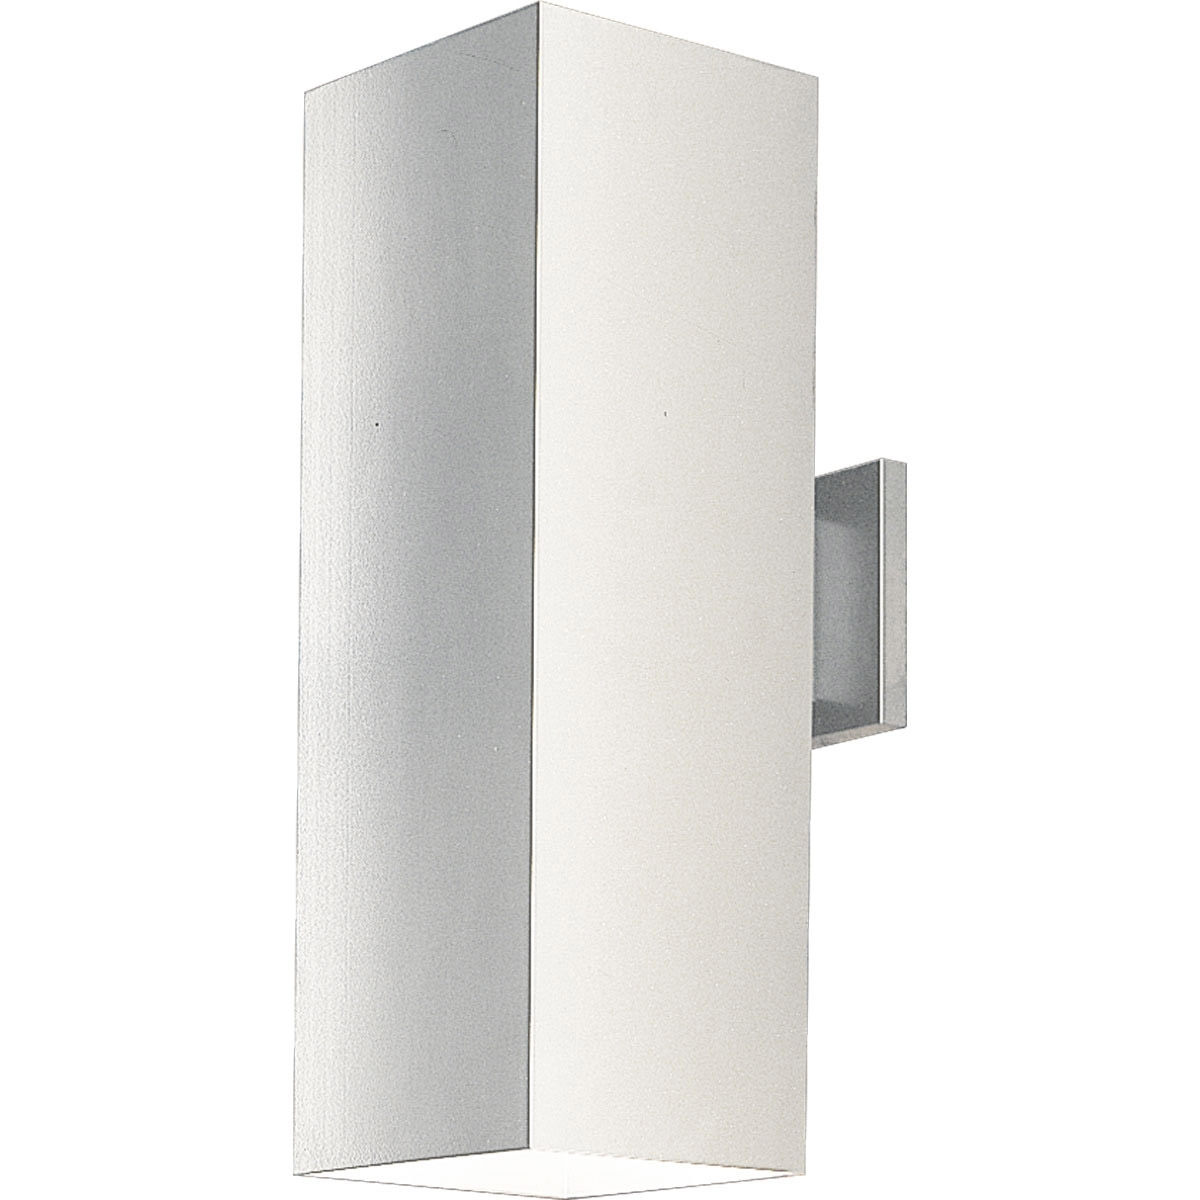 Light : Outdoor Wall Mount Led Light Fixtures Photo Exterior Lights Regarding Most Up To Date Outdoor Wall Sconce Lighting Fixtures (View 6 of 20)